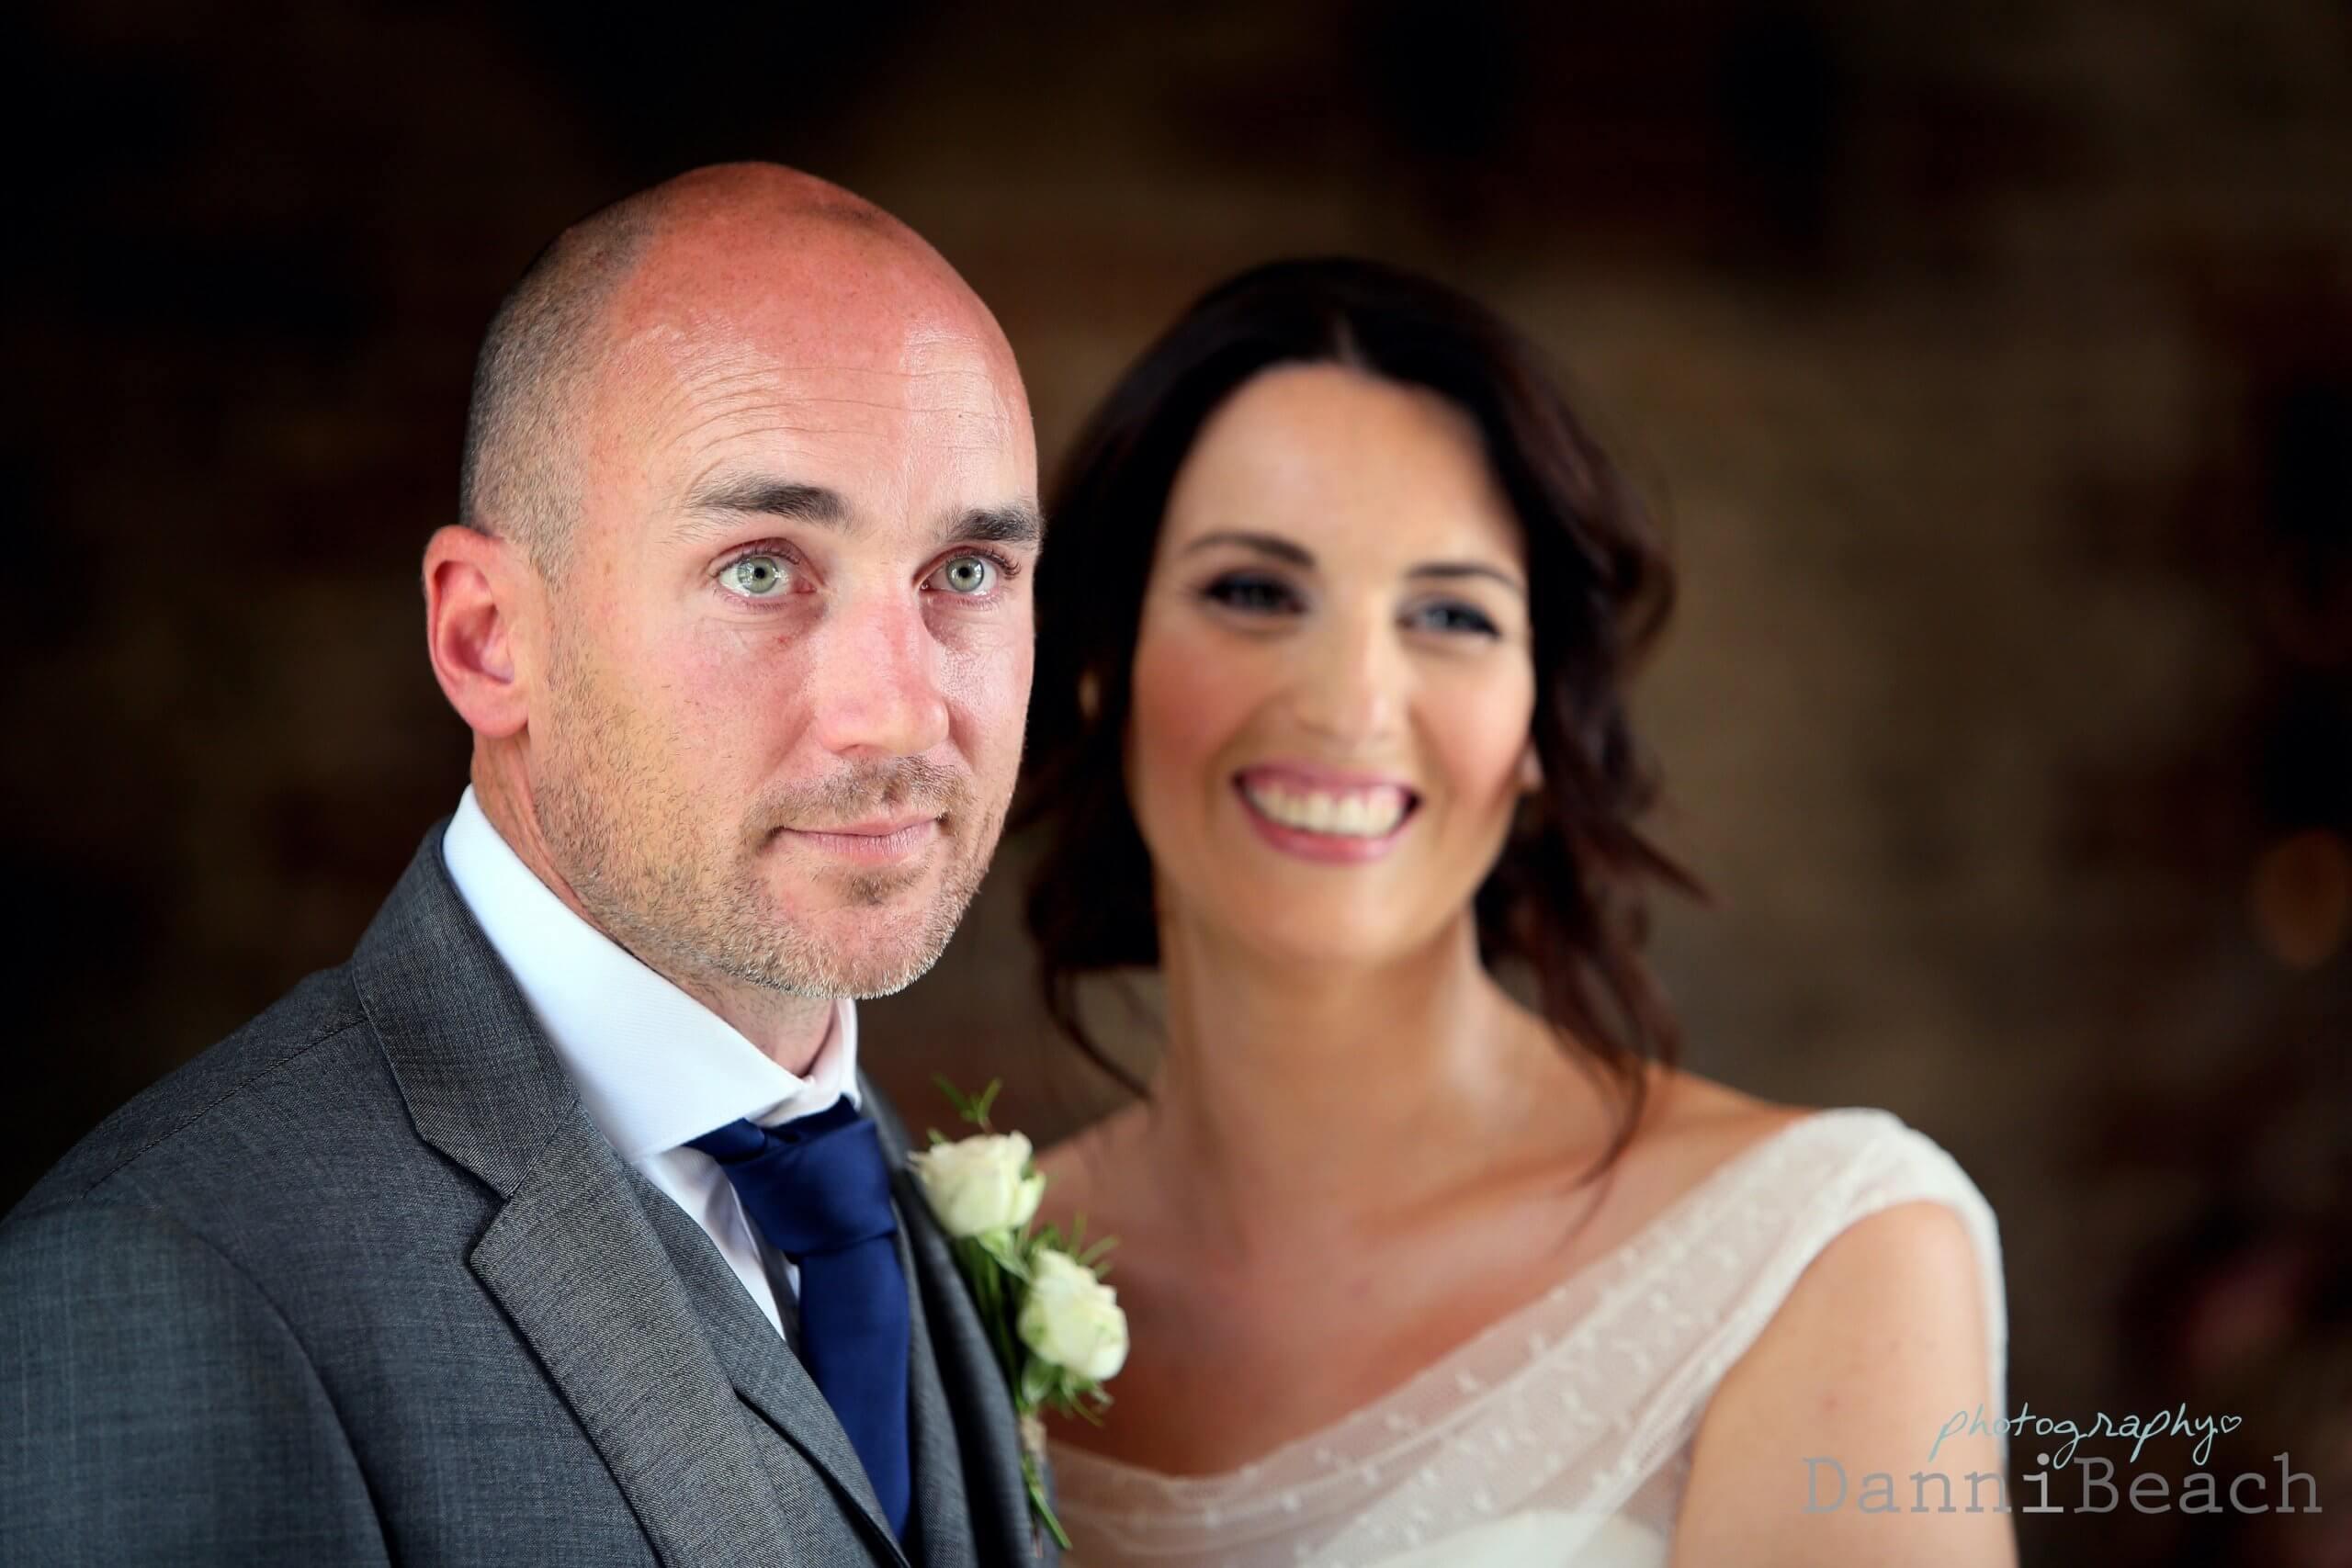 Bride and groom wedding ceremony upwaltham barns